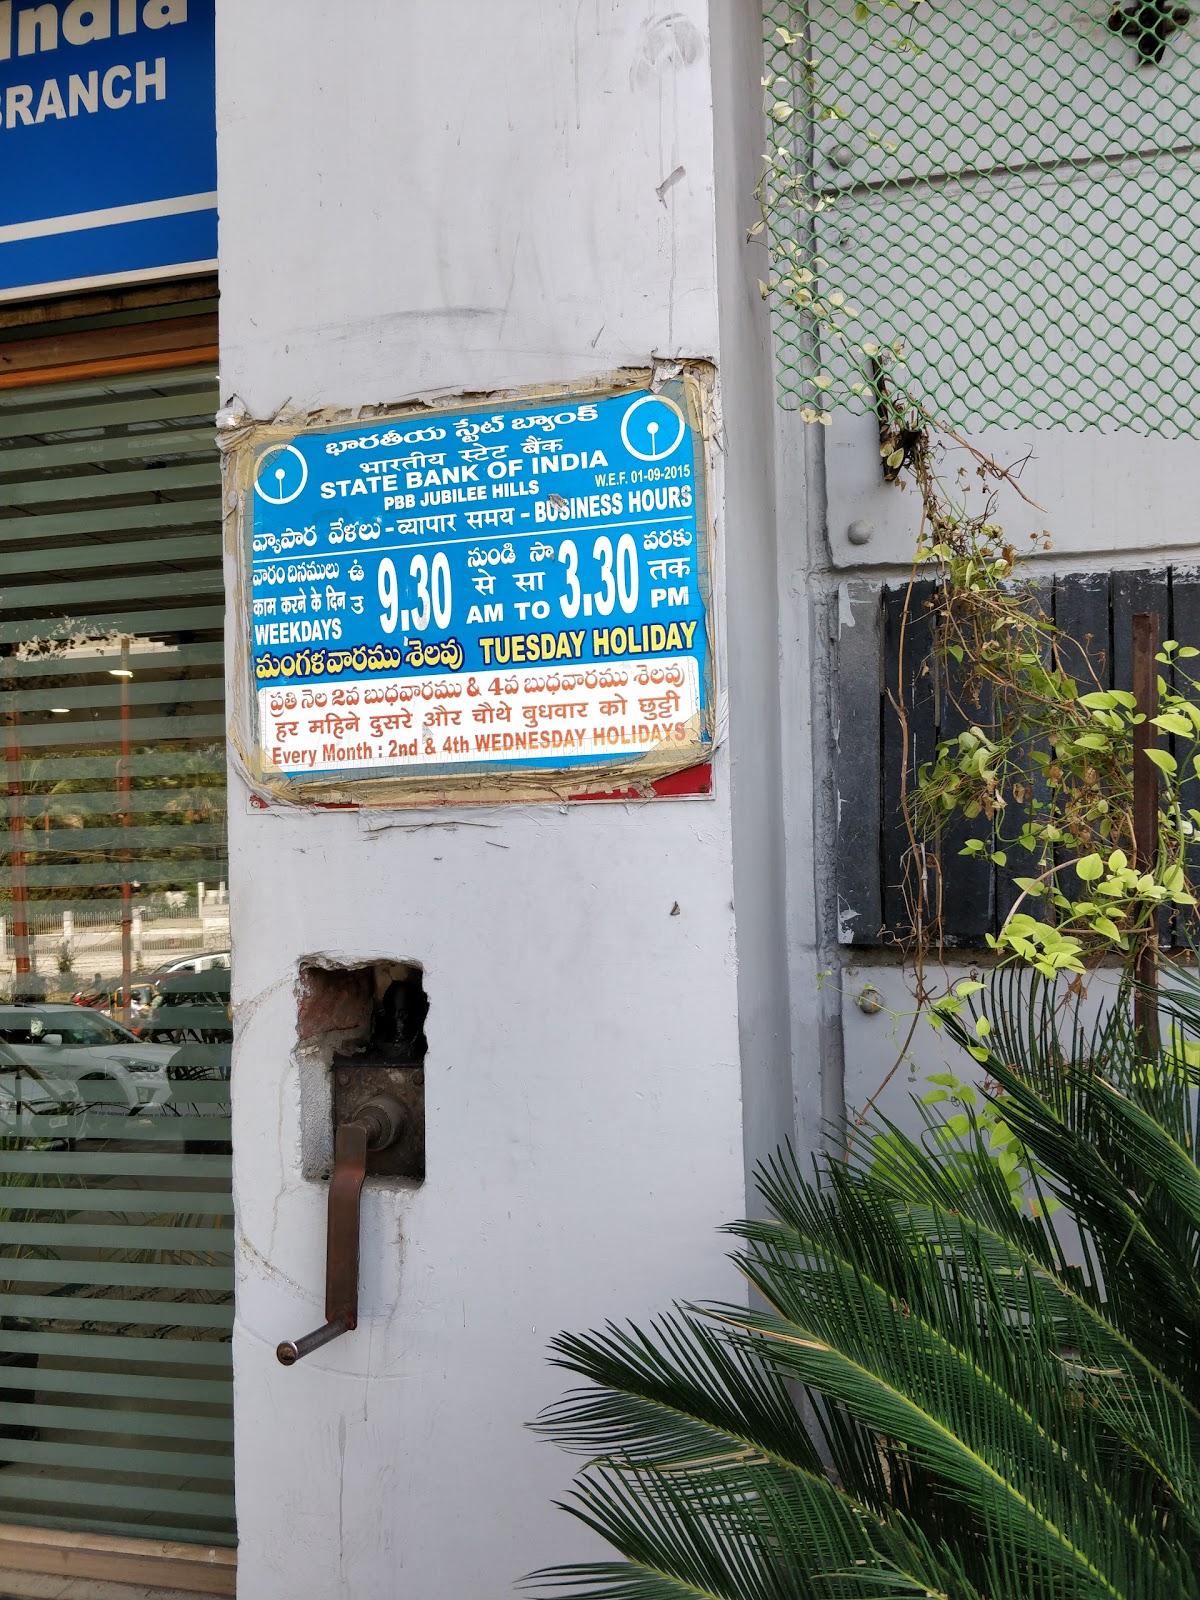 blood bank State Bank Of India PBB Jubilee Hills near Hyderabad Telangana